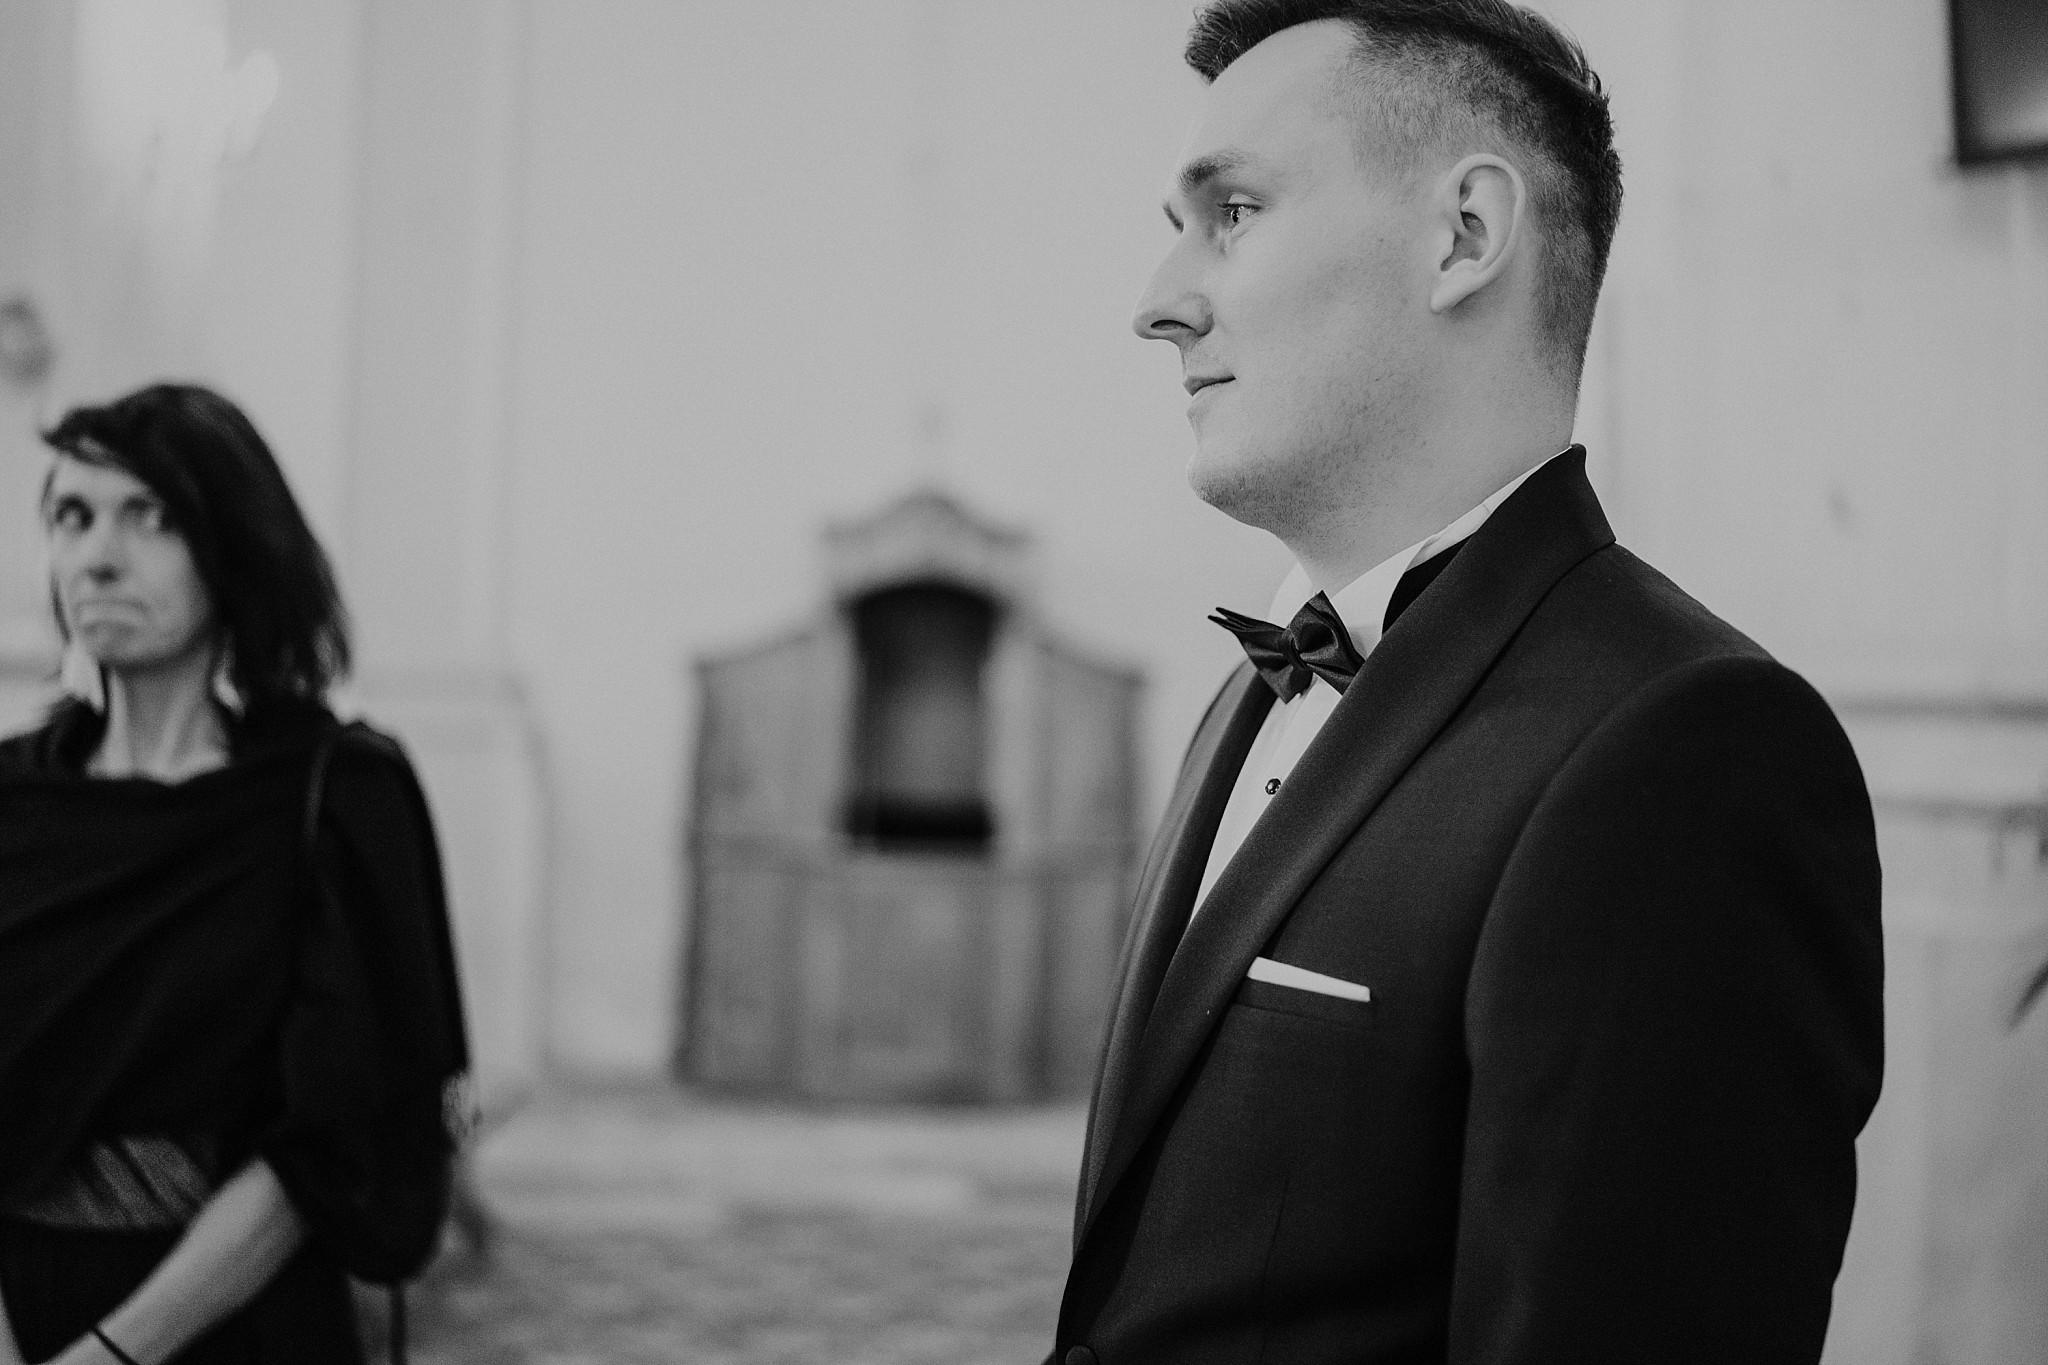 fotograf poznan wesele dobra truskawka piekne wesele pod poznaniem wesele w dobrej truskawce piekna para mloda slub marzen slub koronawirus slub listopad wesele koronawirus 146